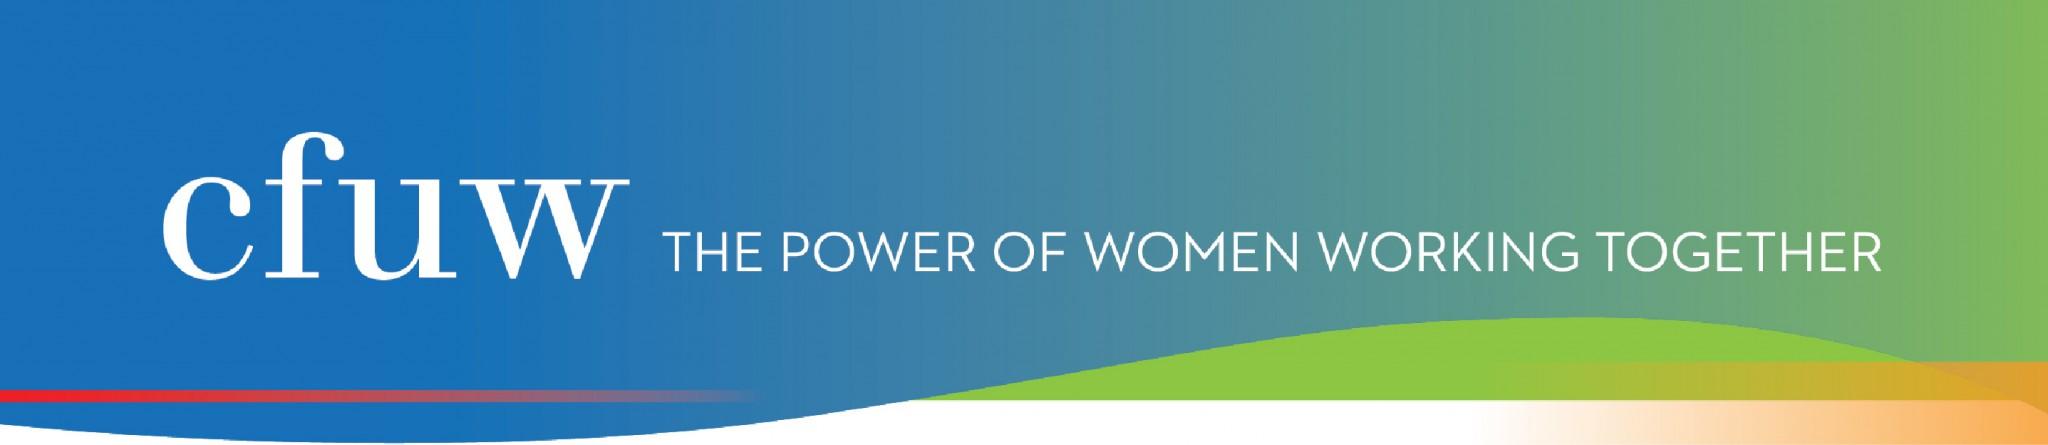 CFUW New Logo Banner - CANADIAN FEDERATION OF UNIVERSITY WOMEN (CFUW) ANUAL HOMES TOUR AND TEA